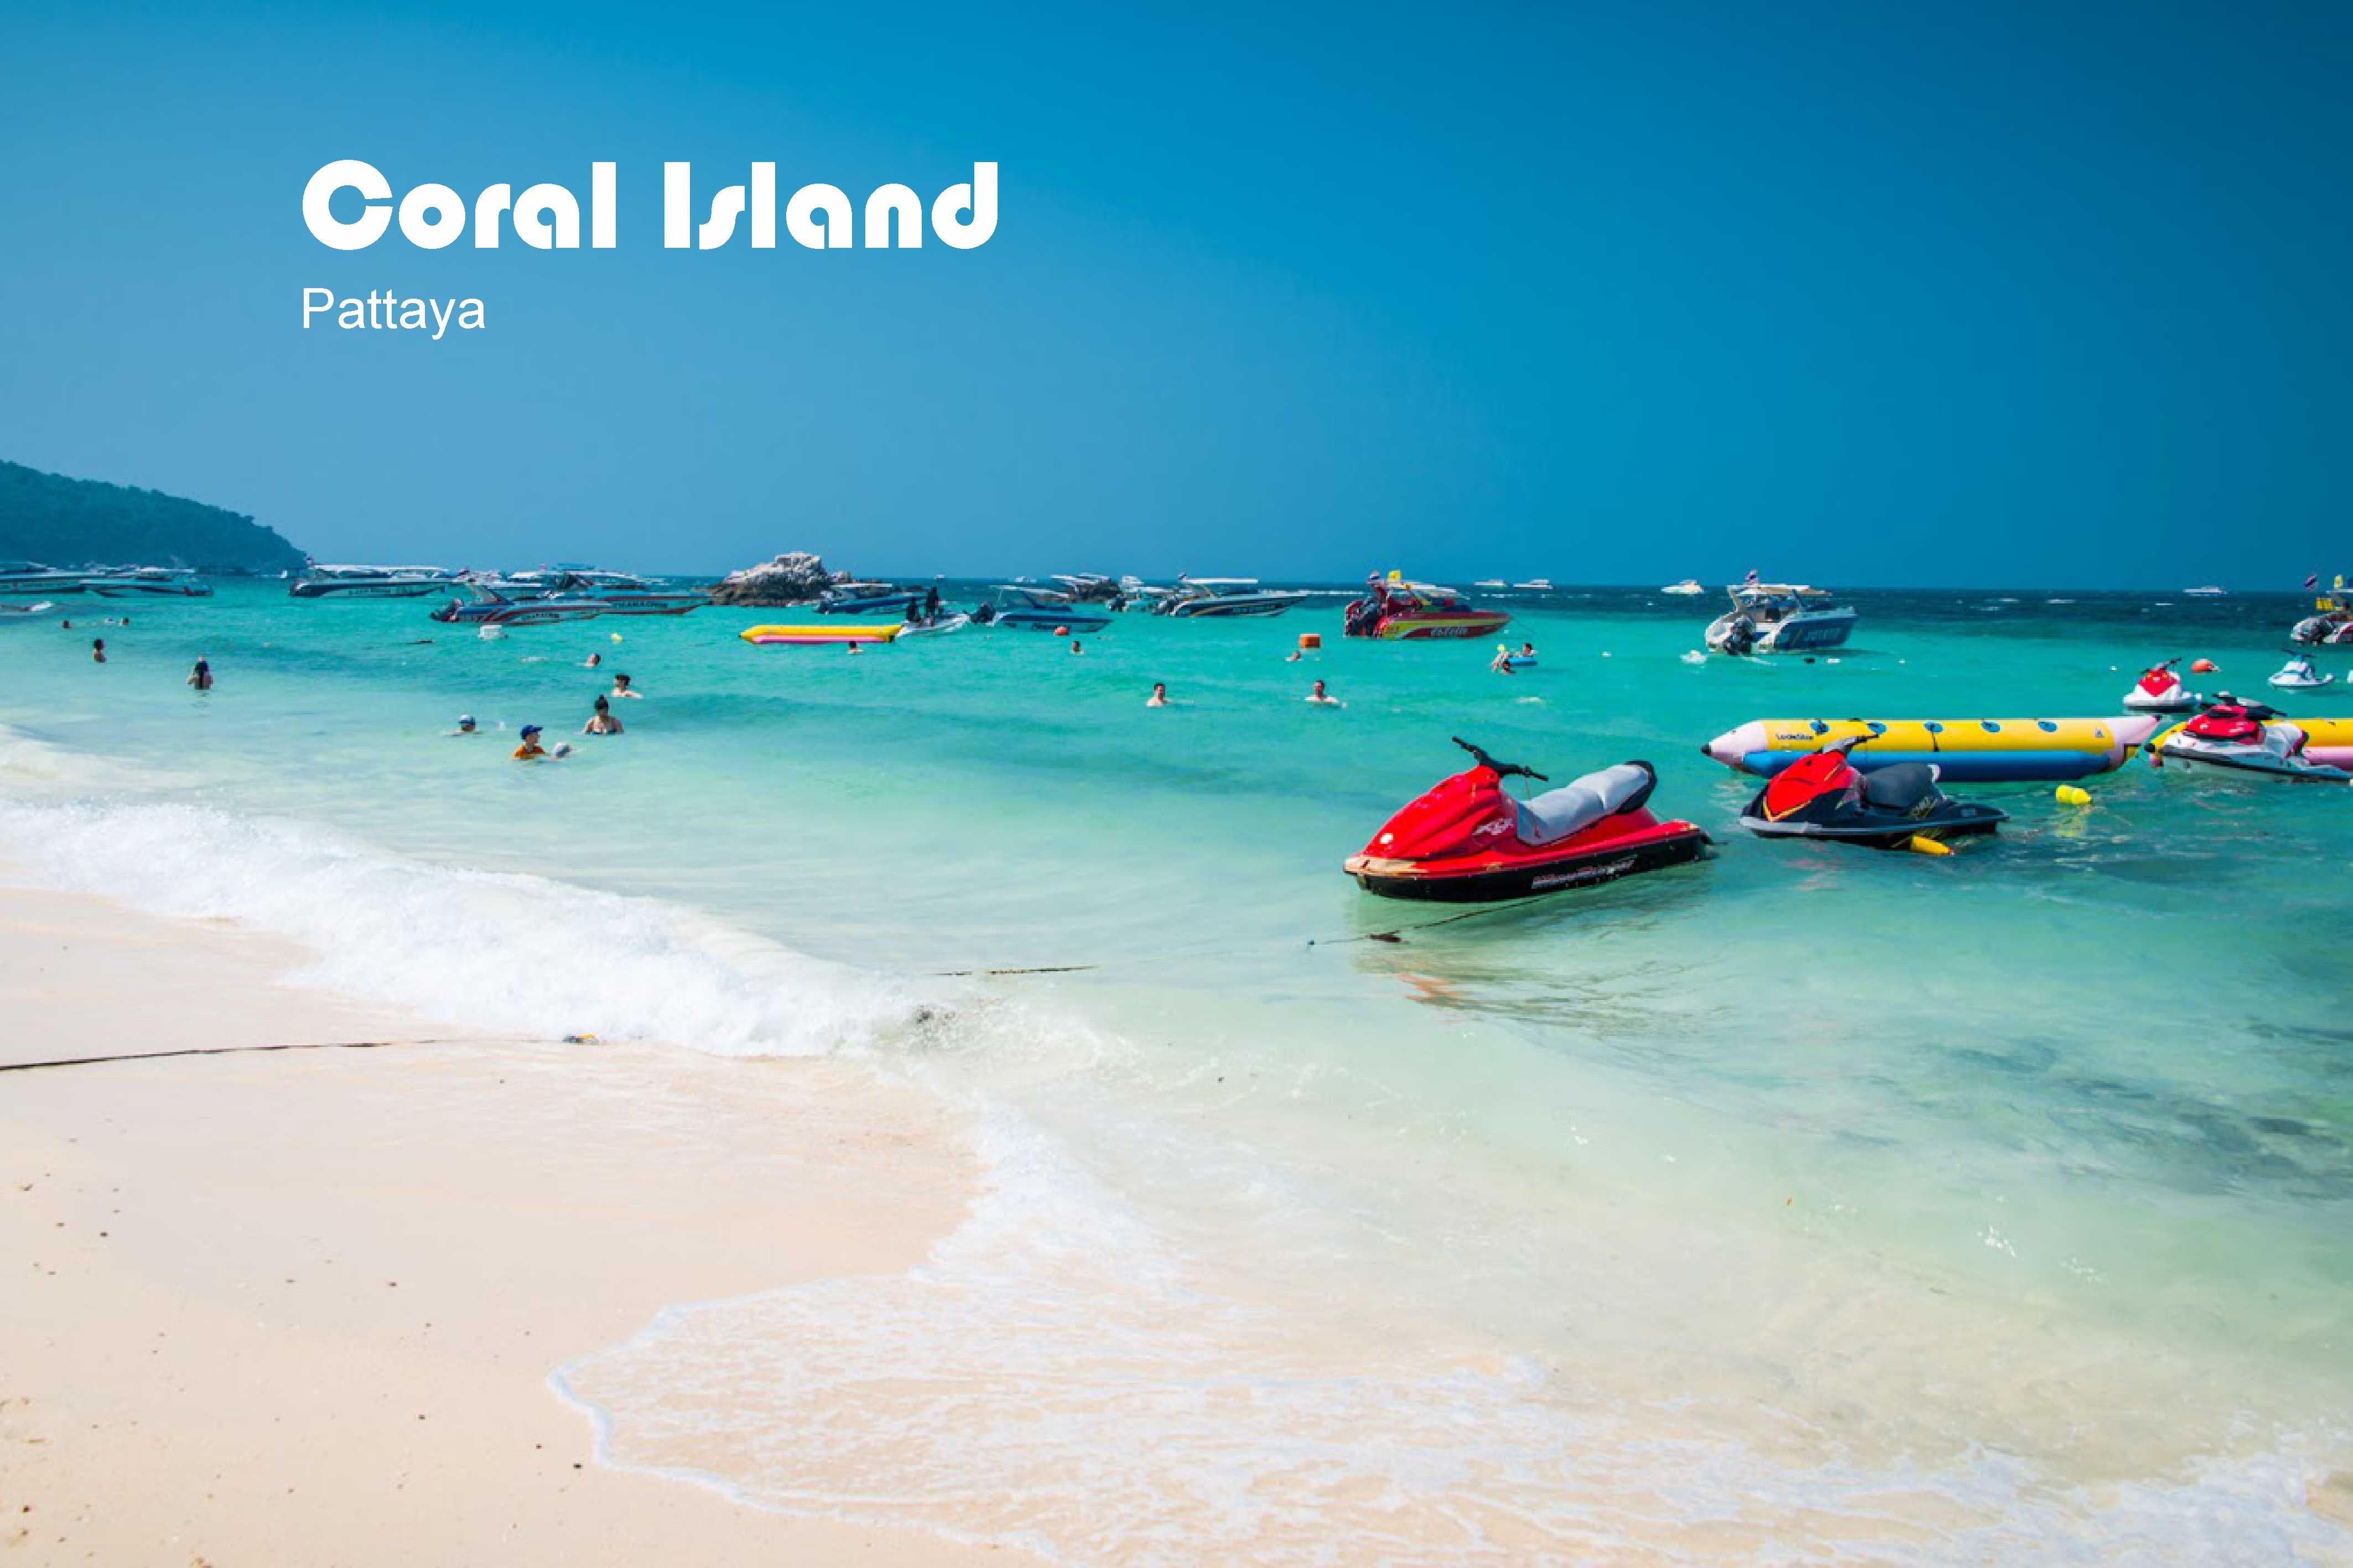 11Coral Island Pattaya